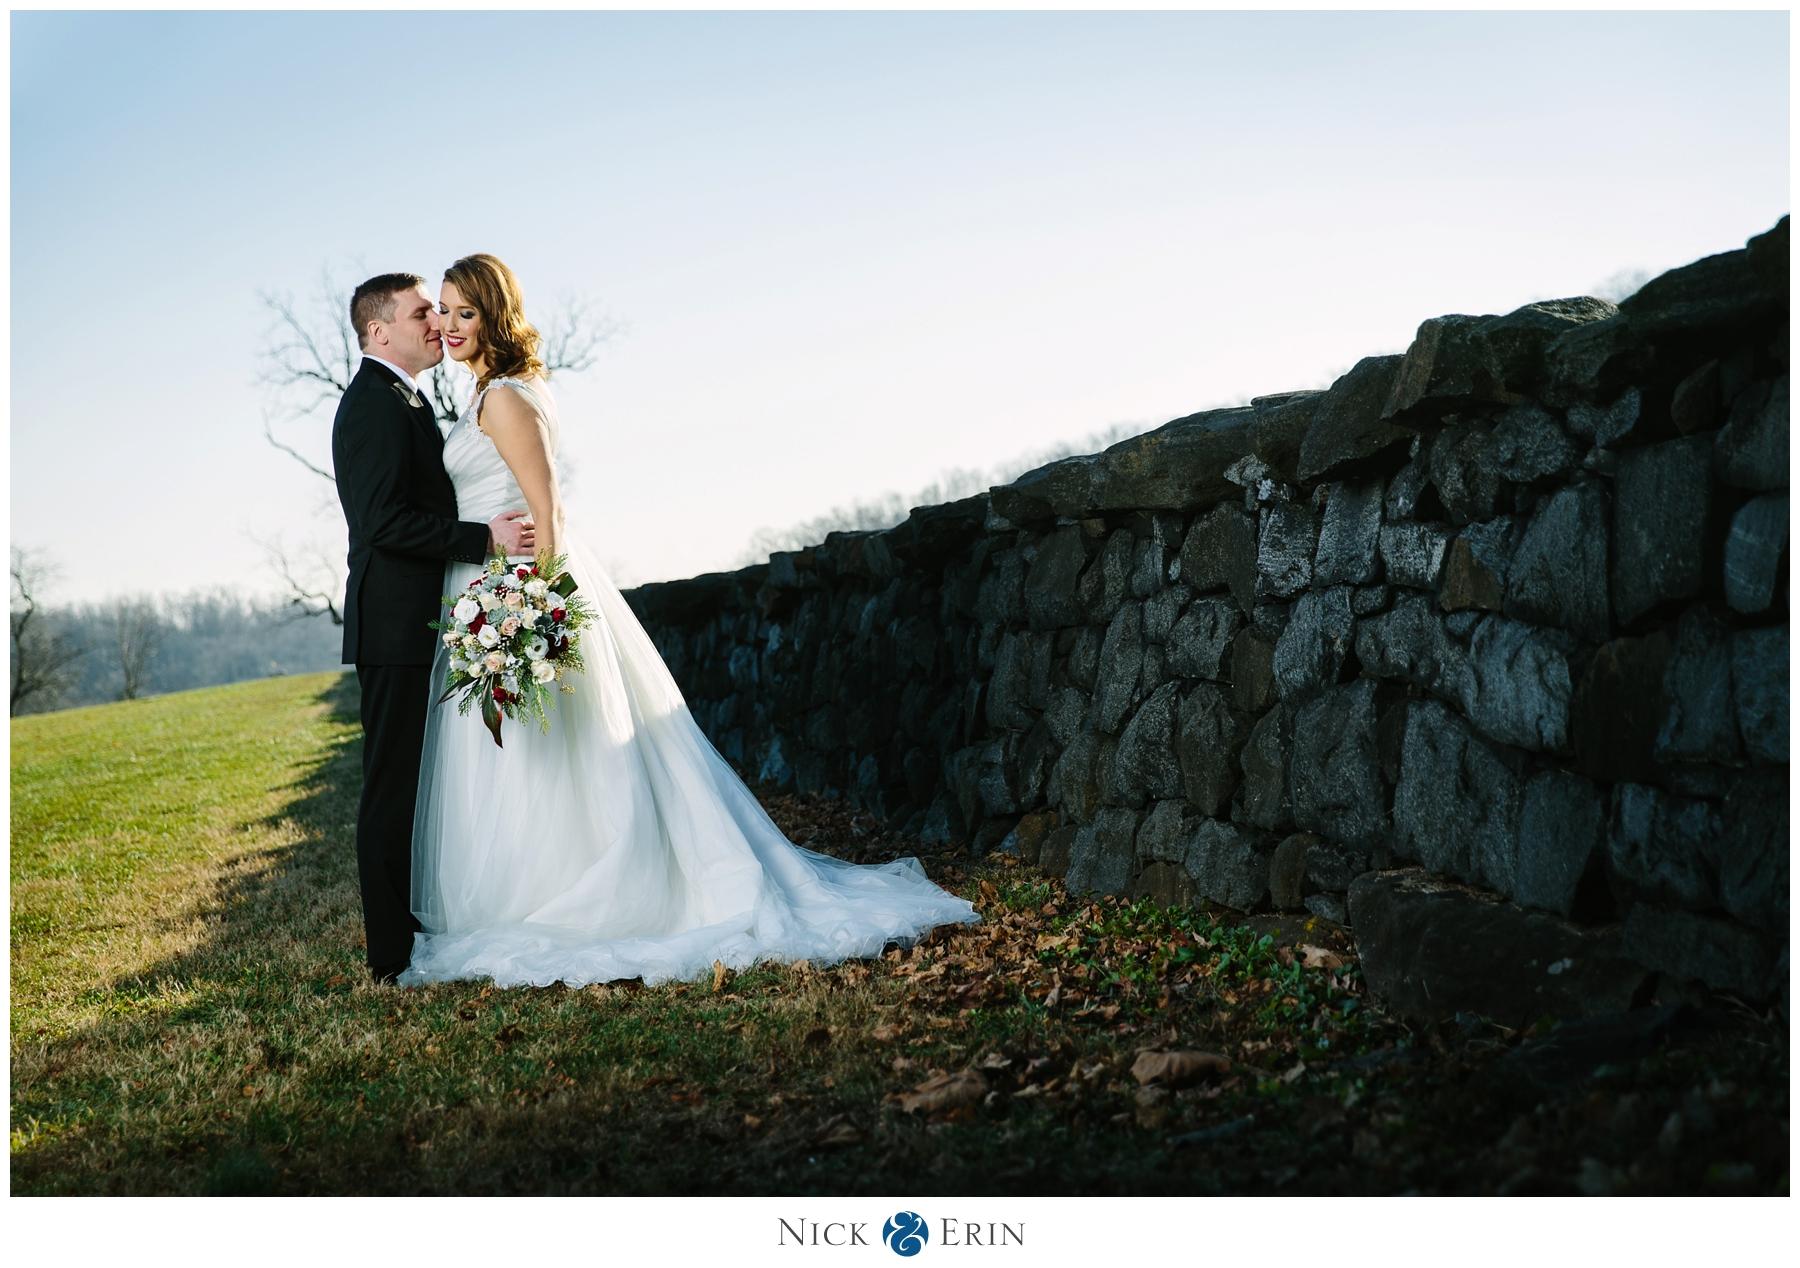 Donner_Photography_Mendenhall Inn Wedding_Blake & Kristina_0007